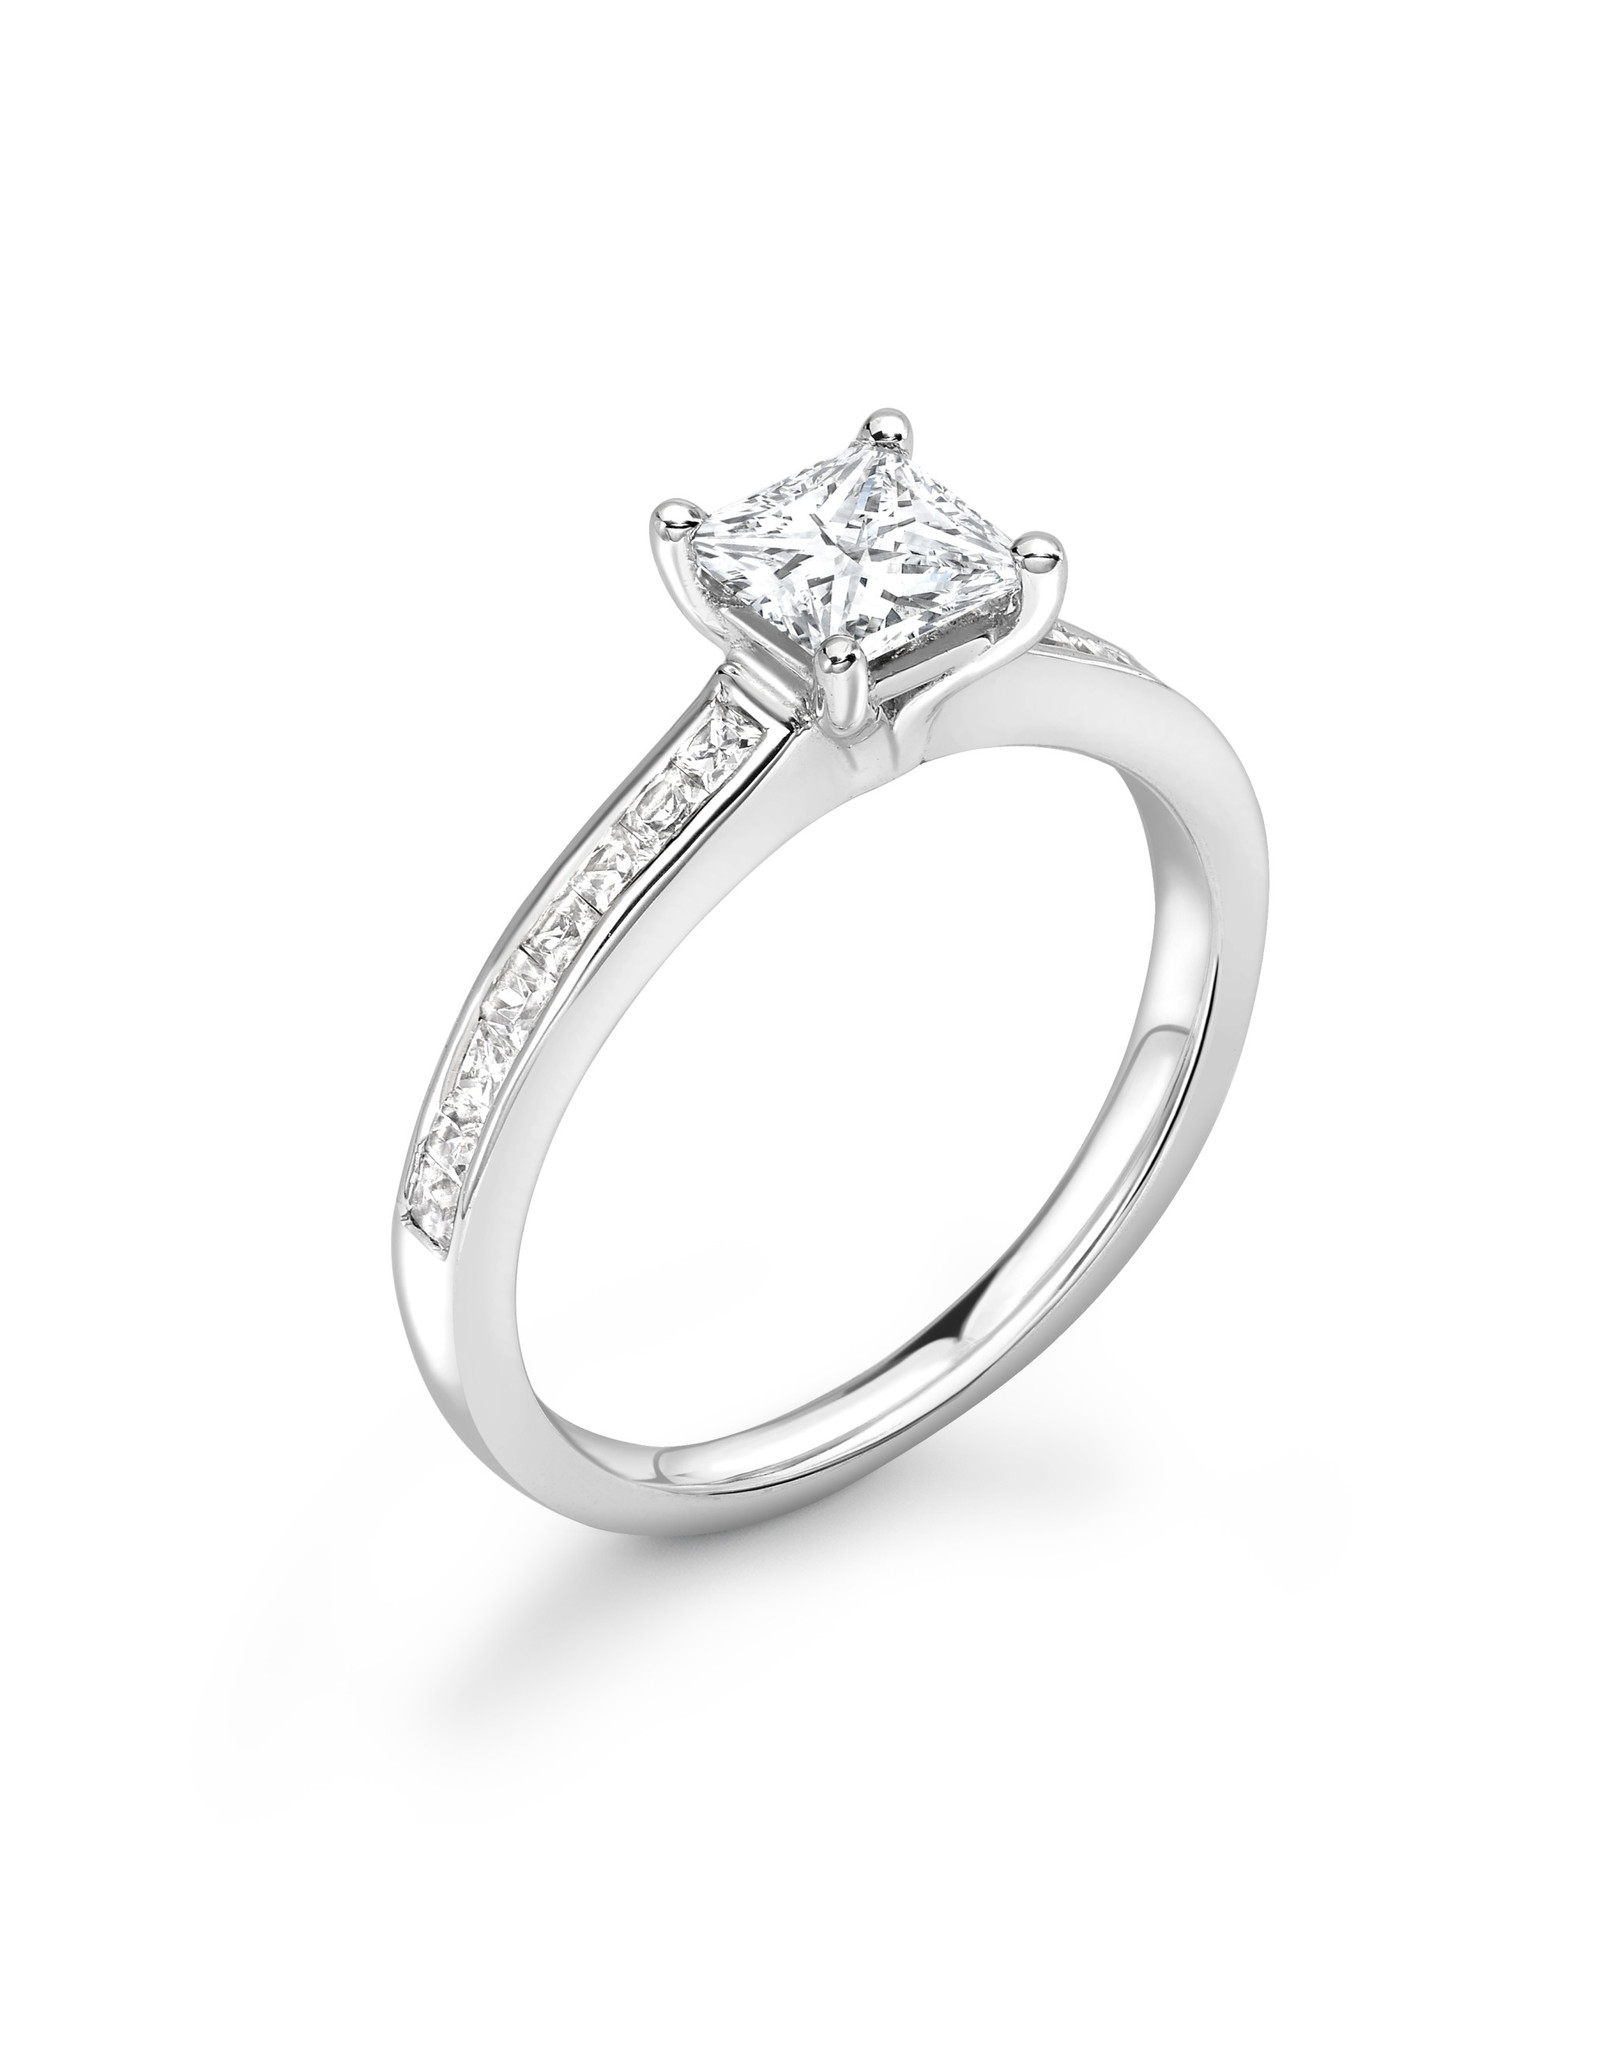 LVN Princesse Verlovingsring Met Zijsteentjes LVNRX3120